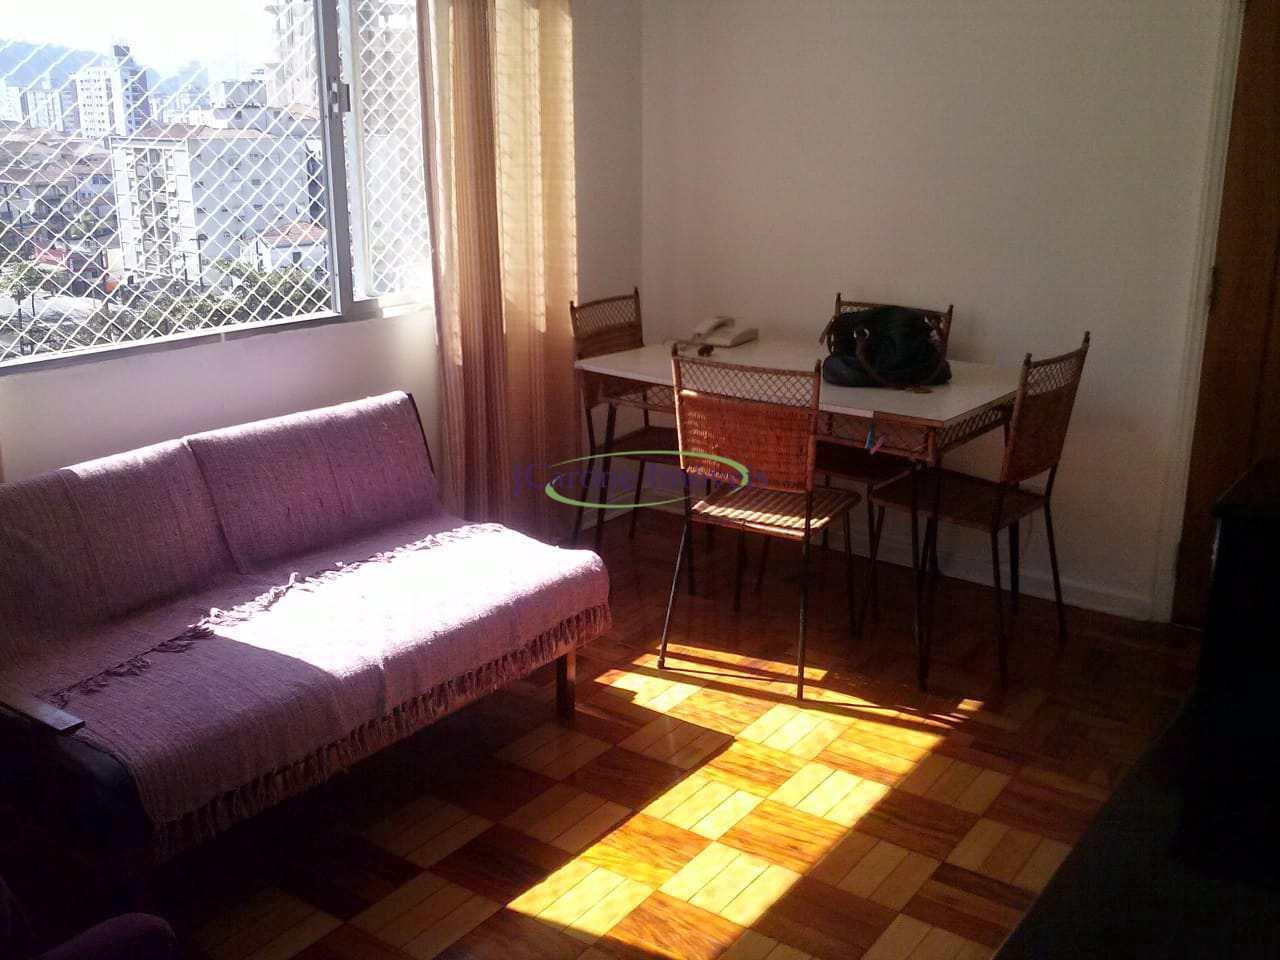 Apartamento com 1 dorm, José Menino, Santos, Cod: 64152405